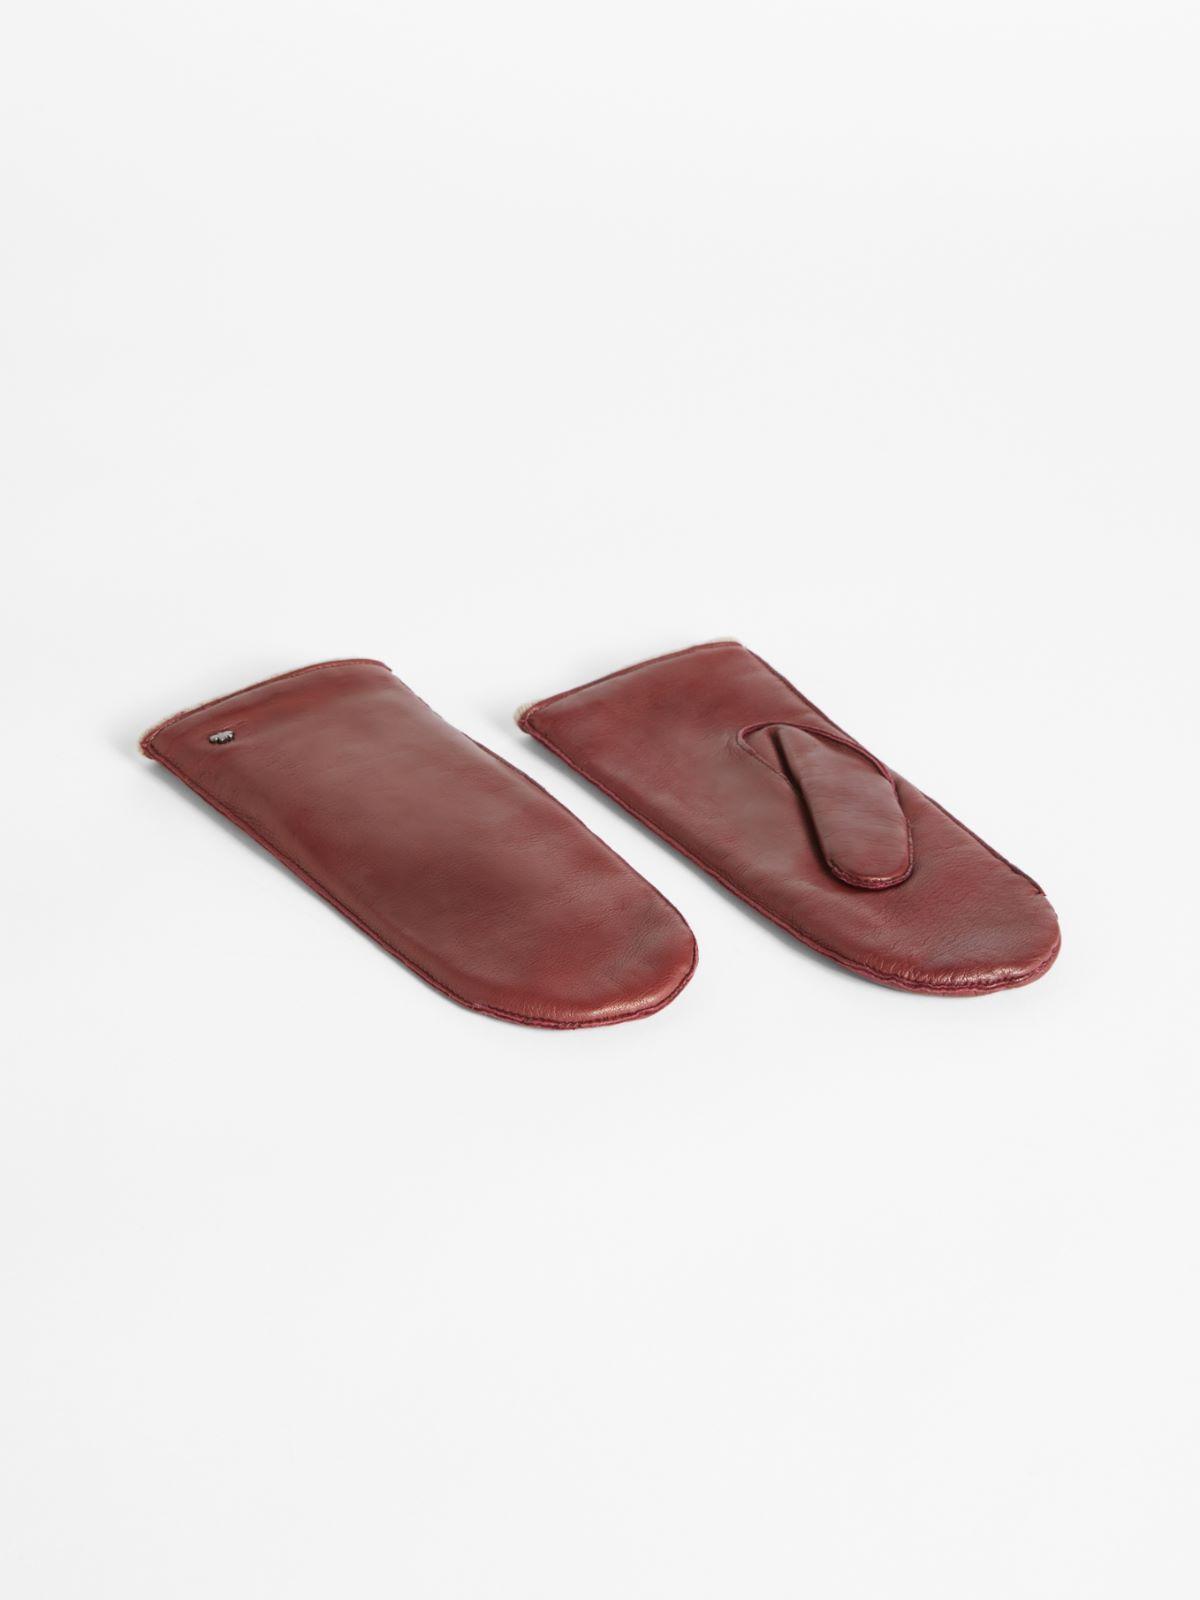 Nappa leather mittens Weekend Maxmara